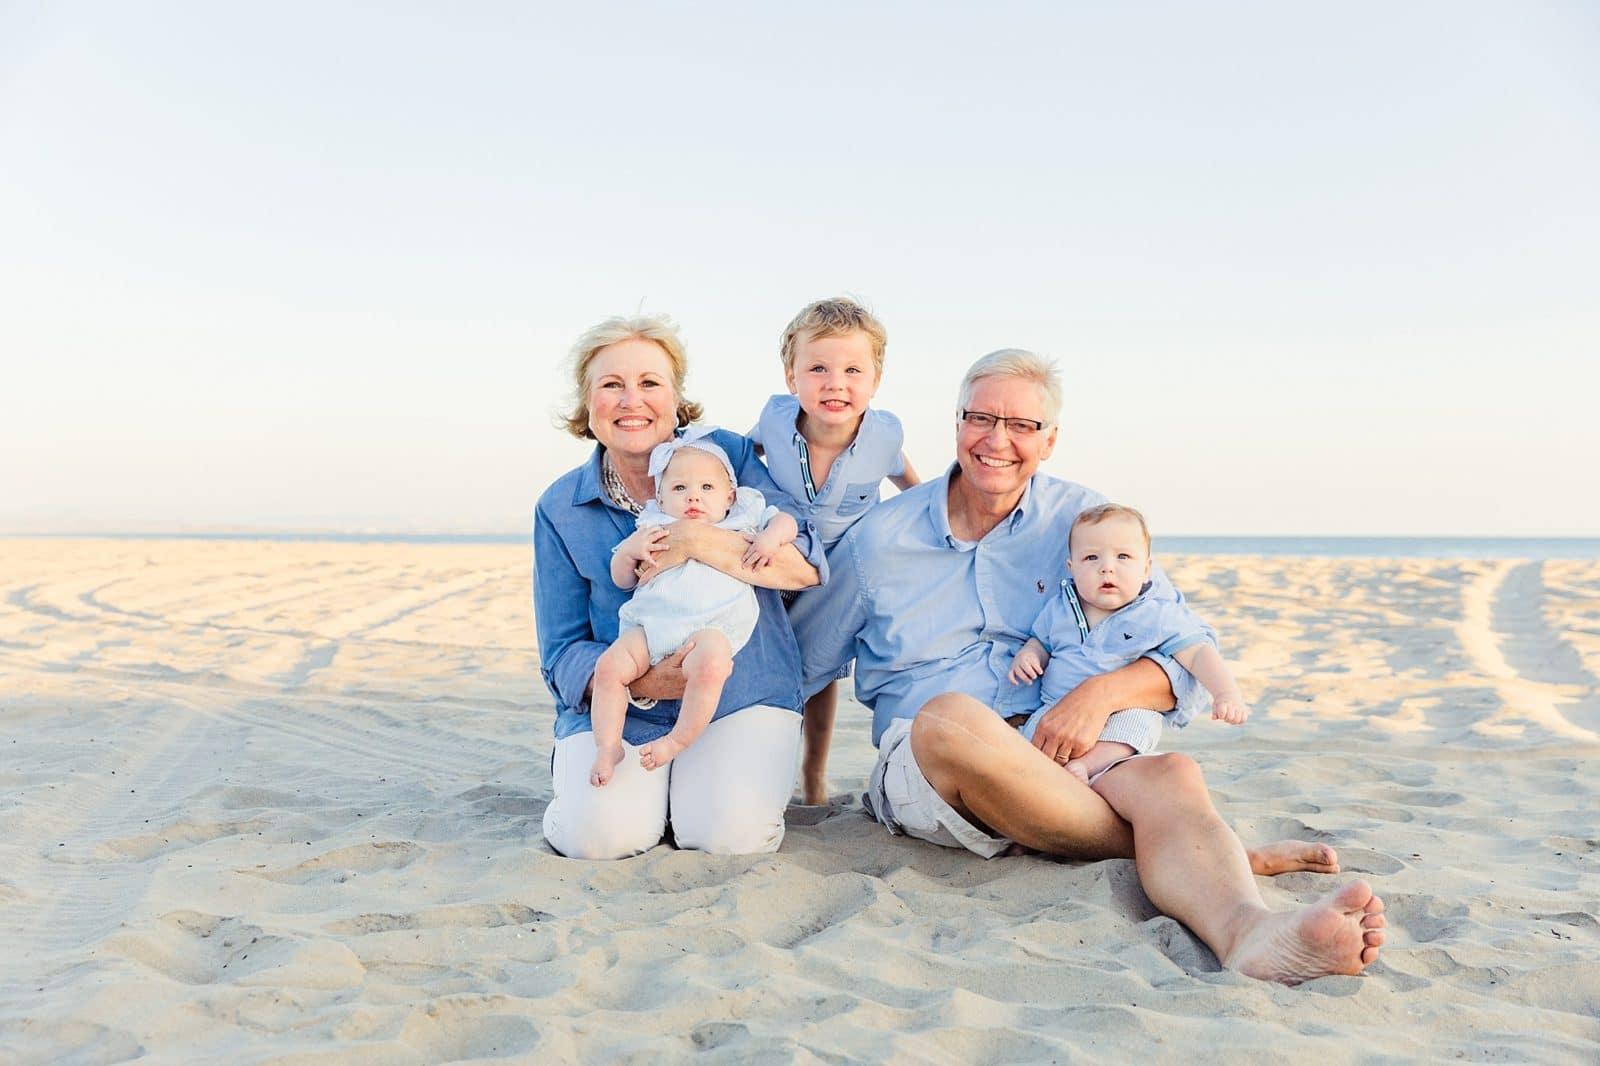 San Diego Family Photographer   Amy Gray Photography